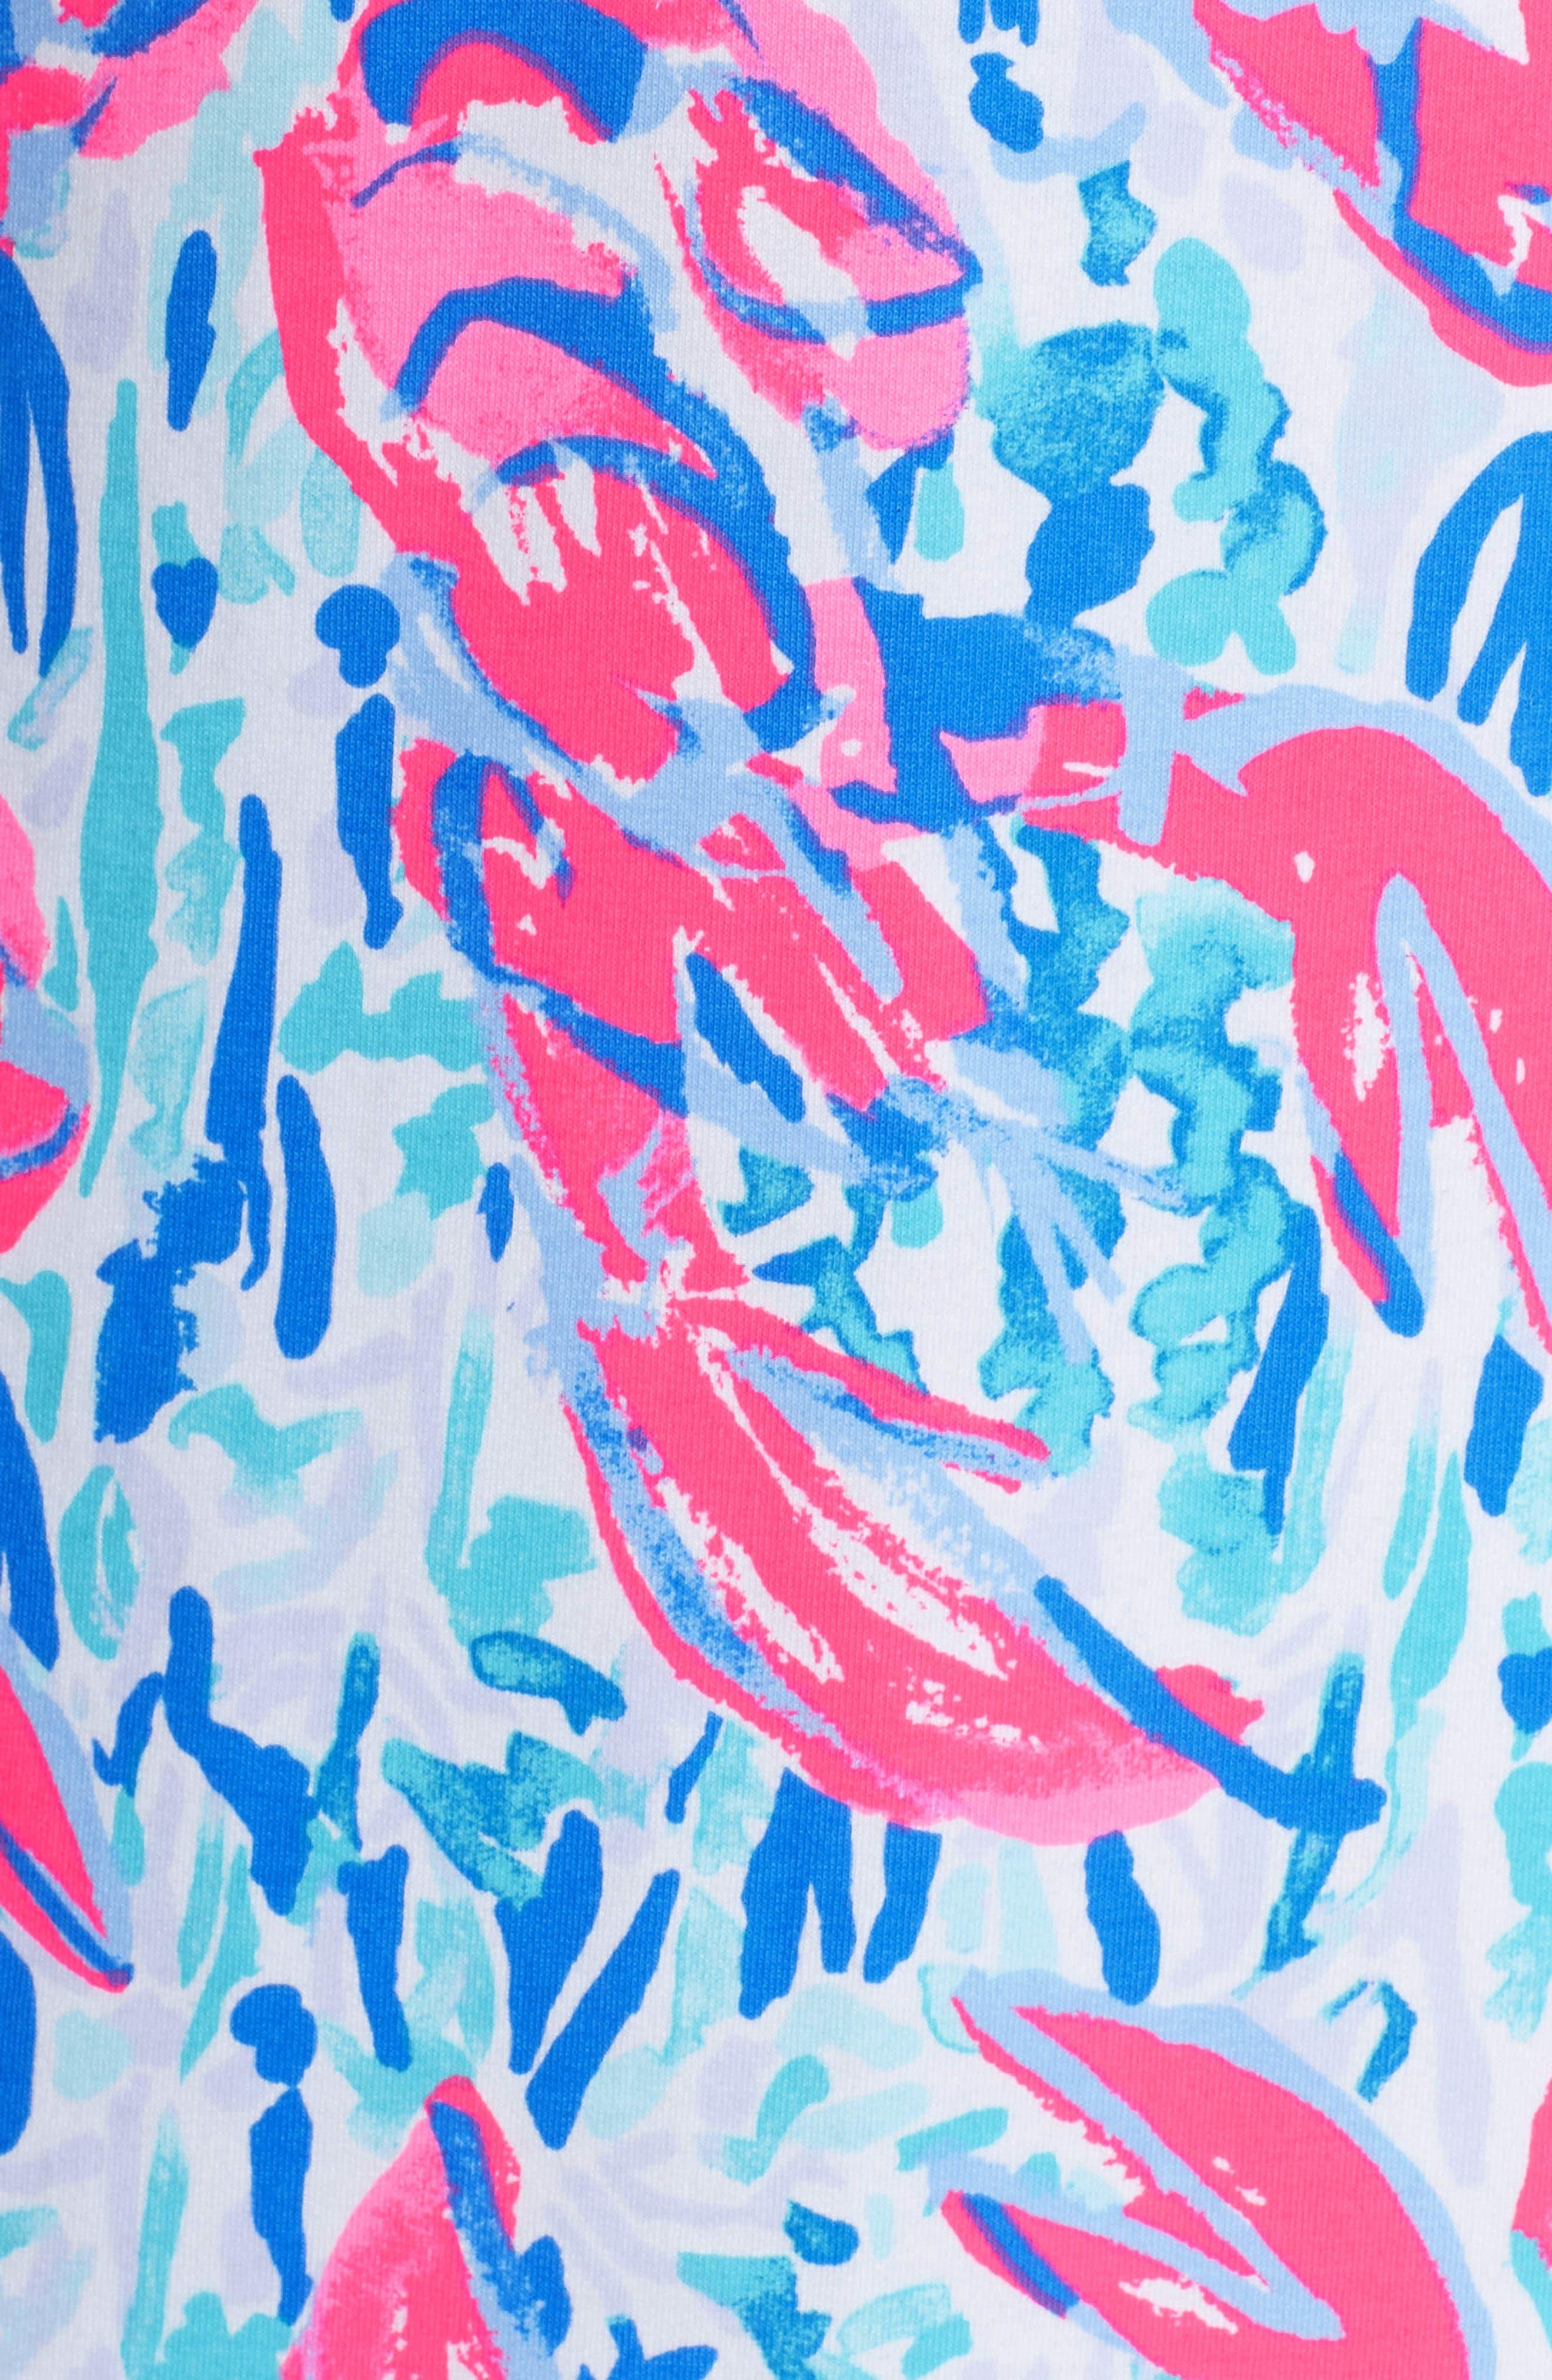 Harper Shift Dress,                             Alternate thumbnail 5, color,                             Cosmic Coral Cracked Up